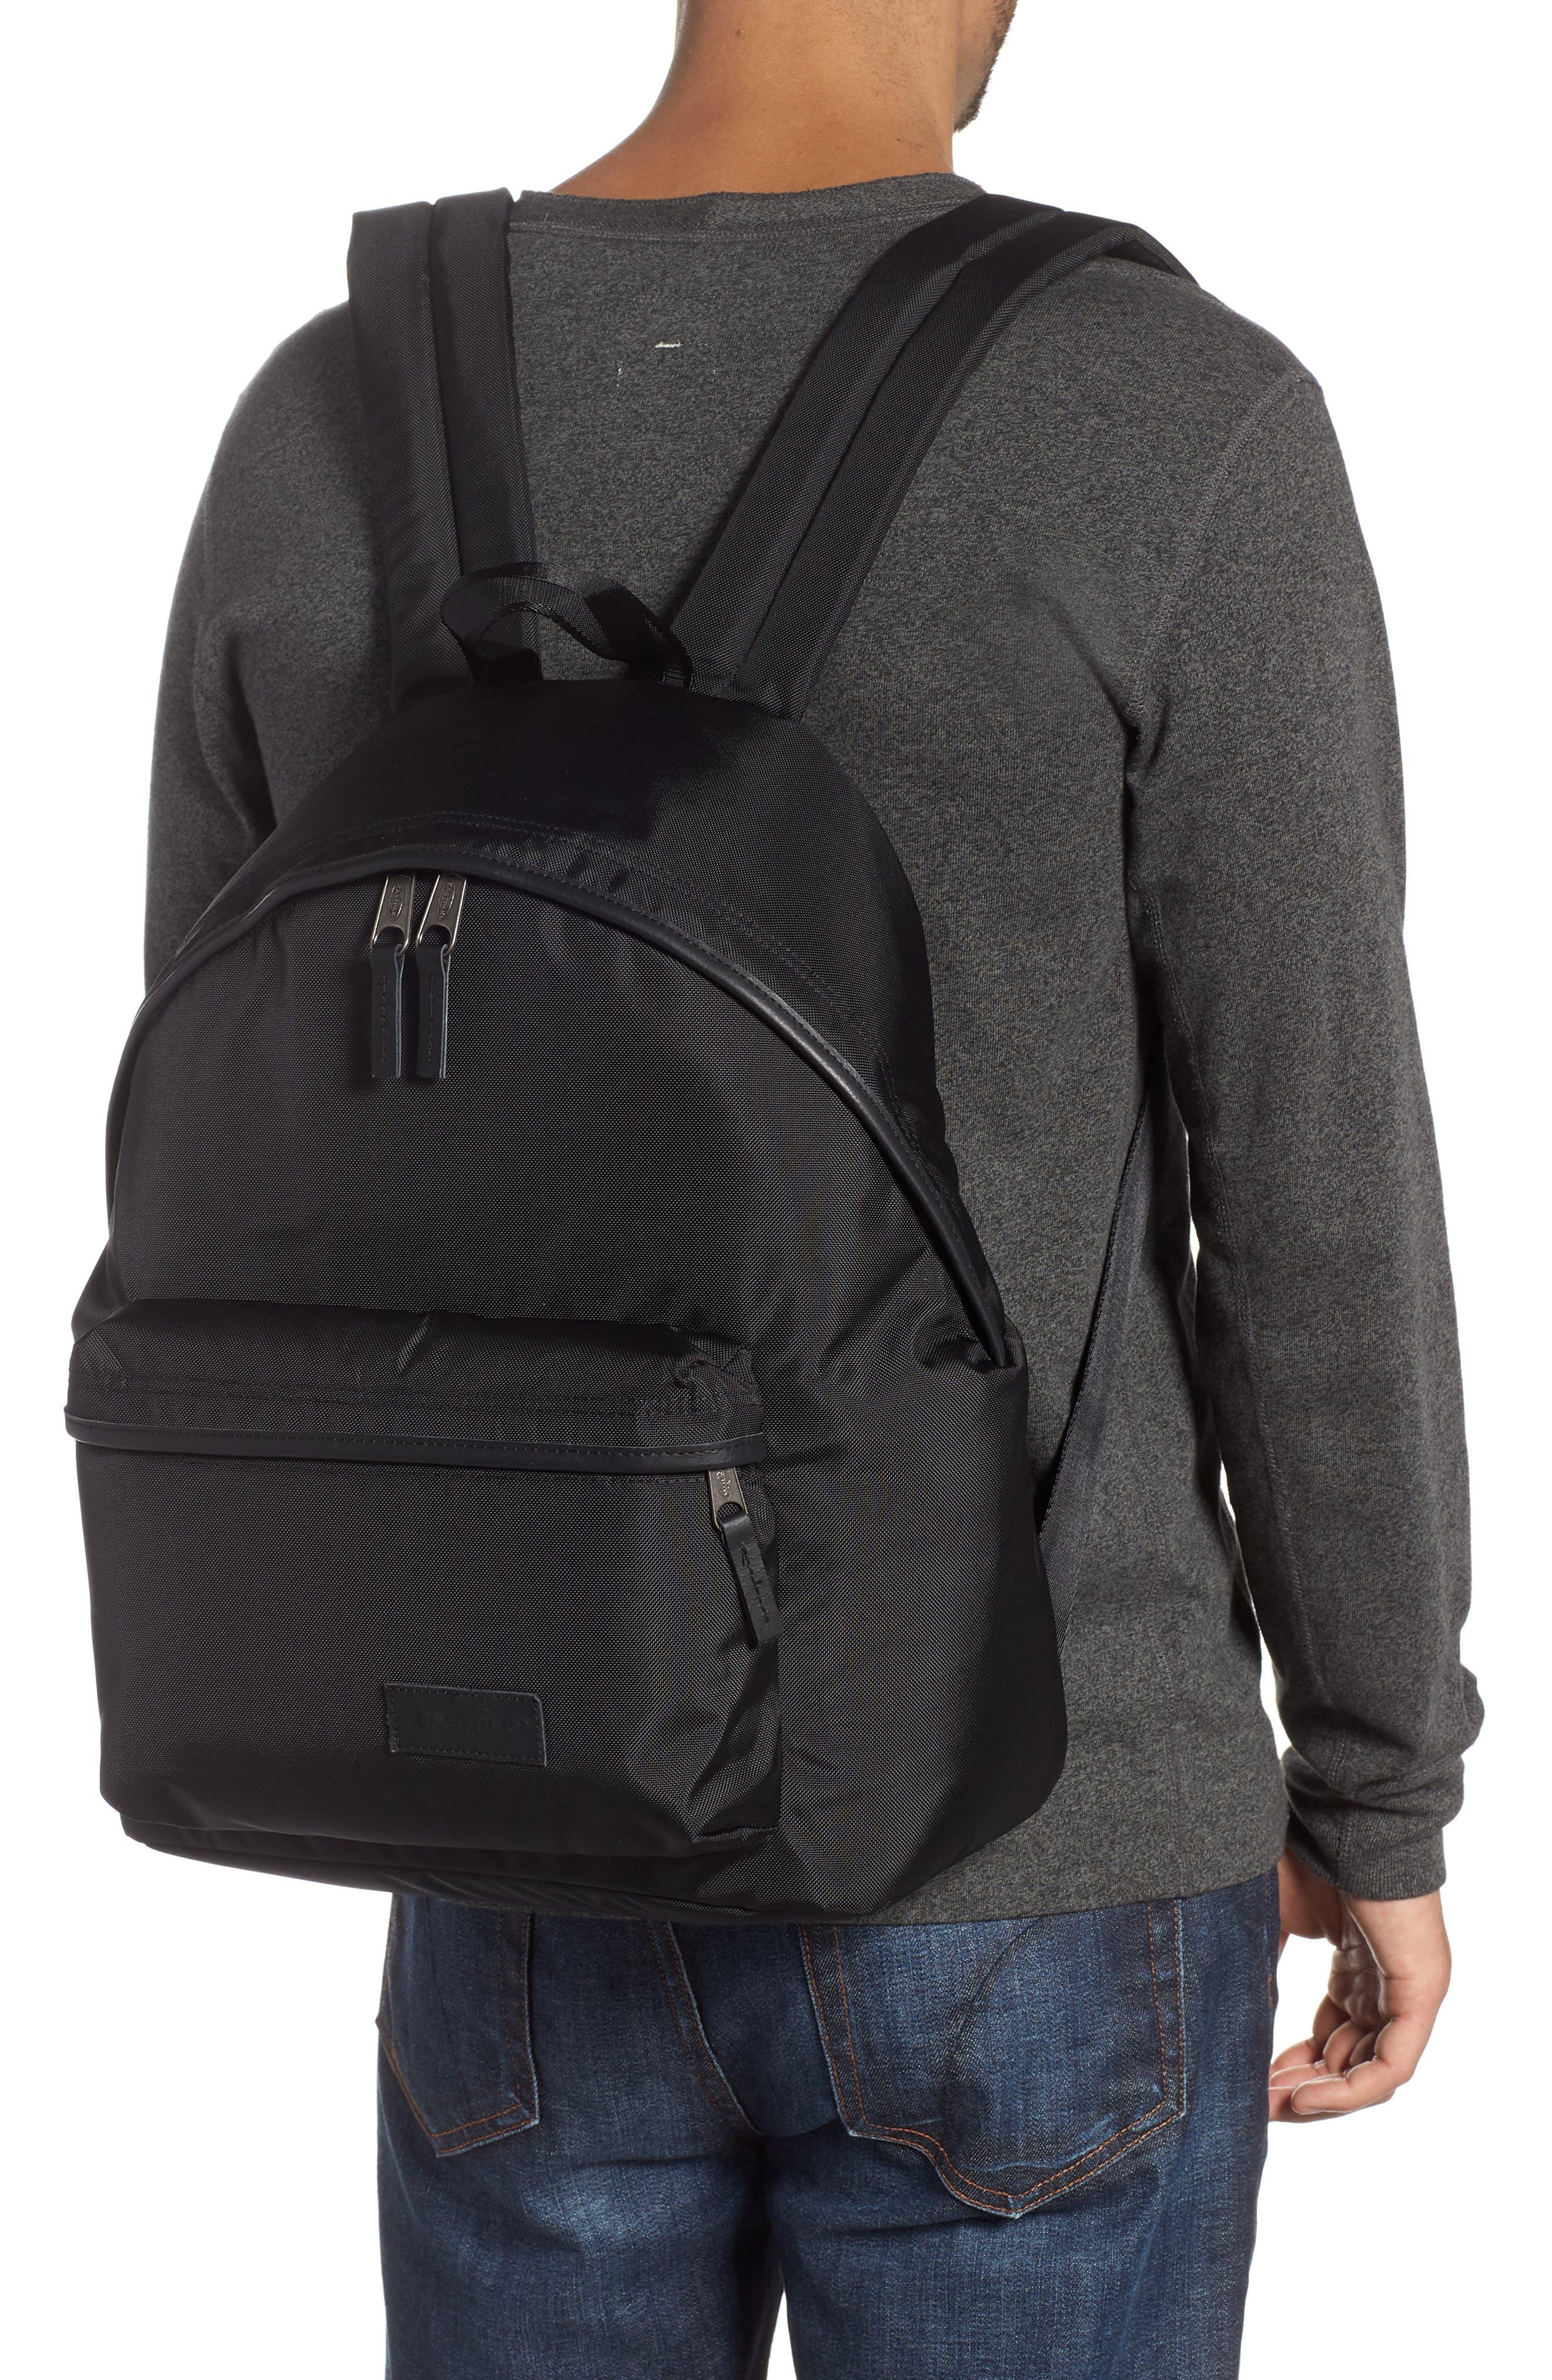 Padded Pakr Backpack,                             Alternate thumbnail 2, color,                             CONSTRUCTED BLACK